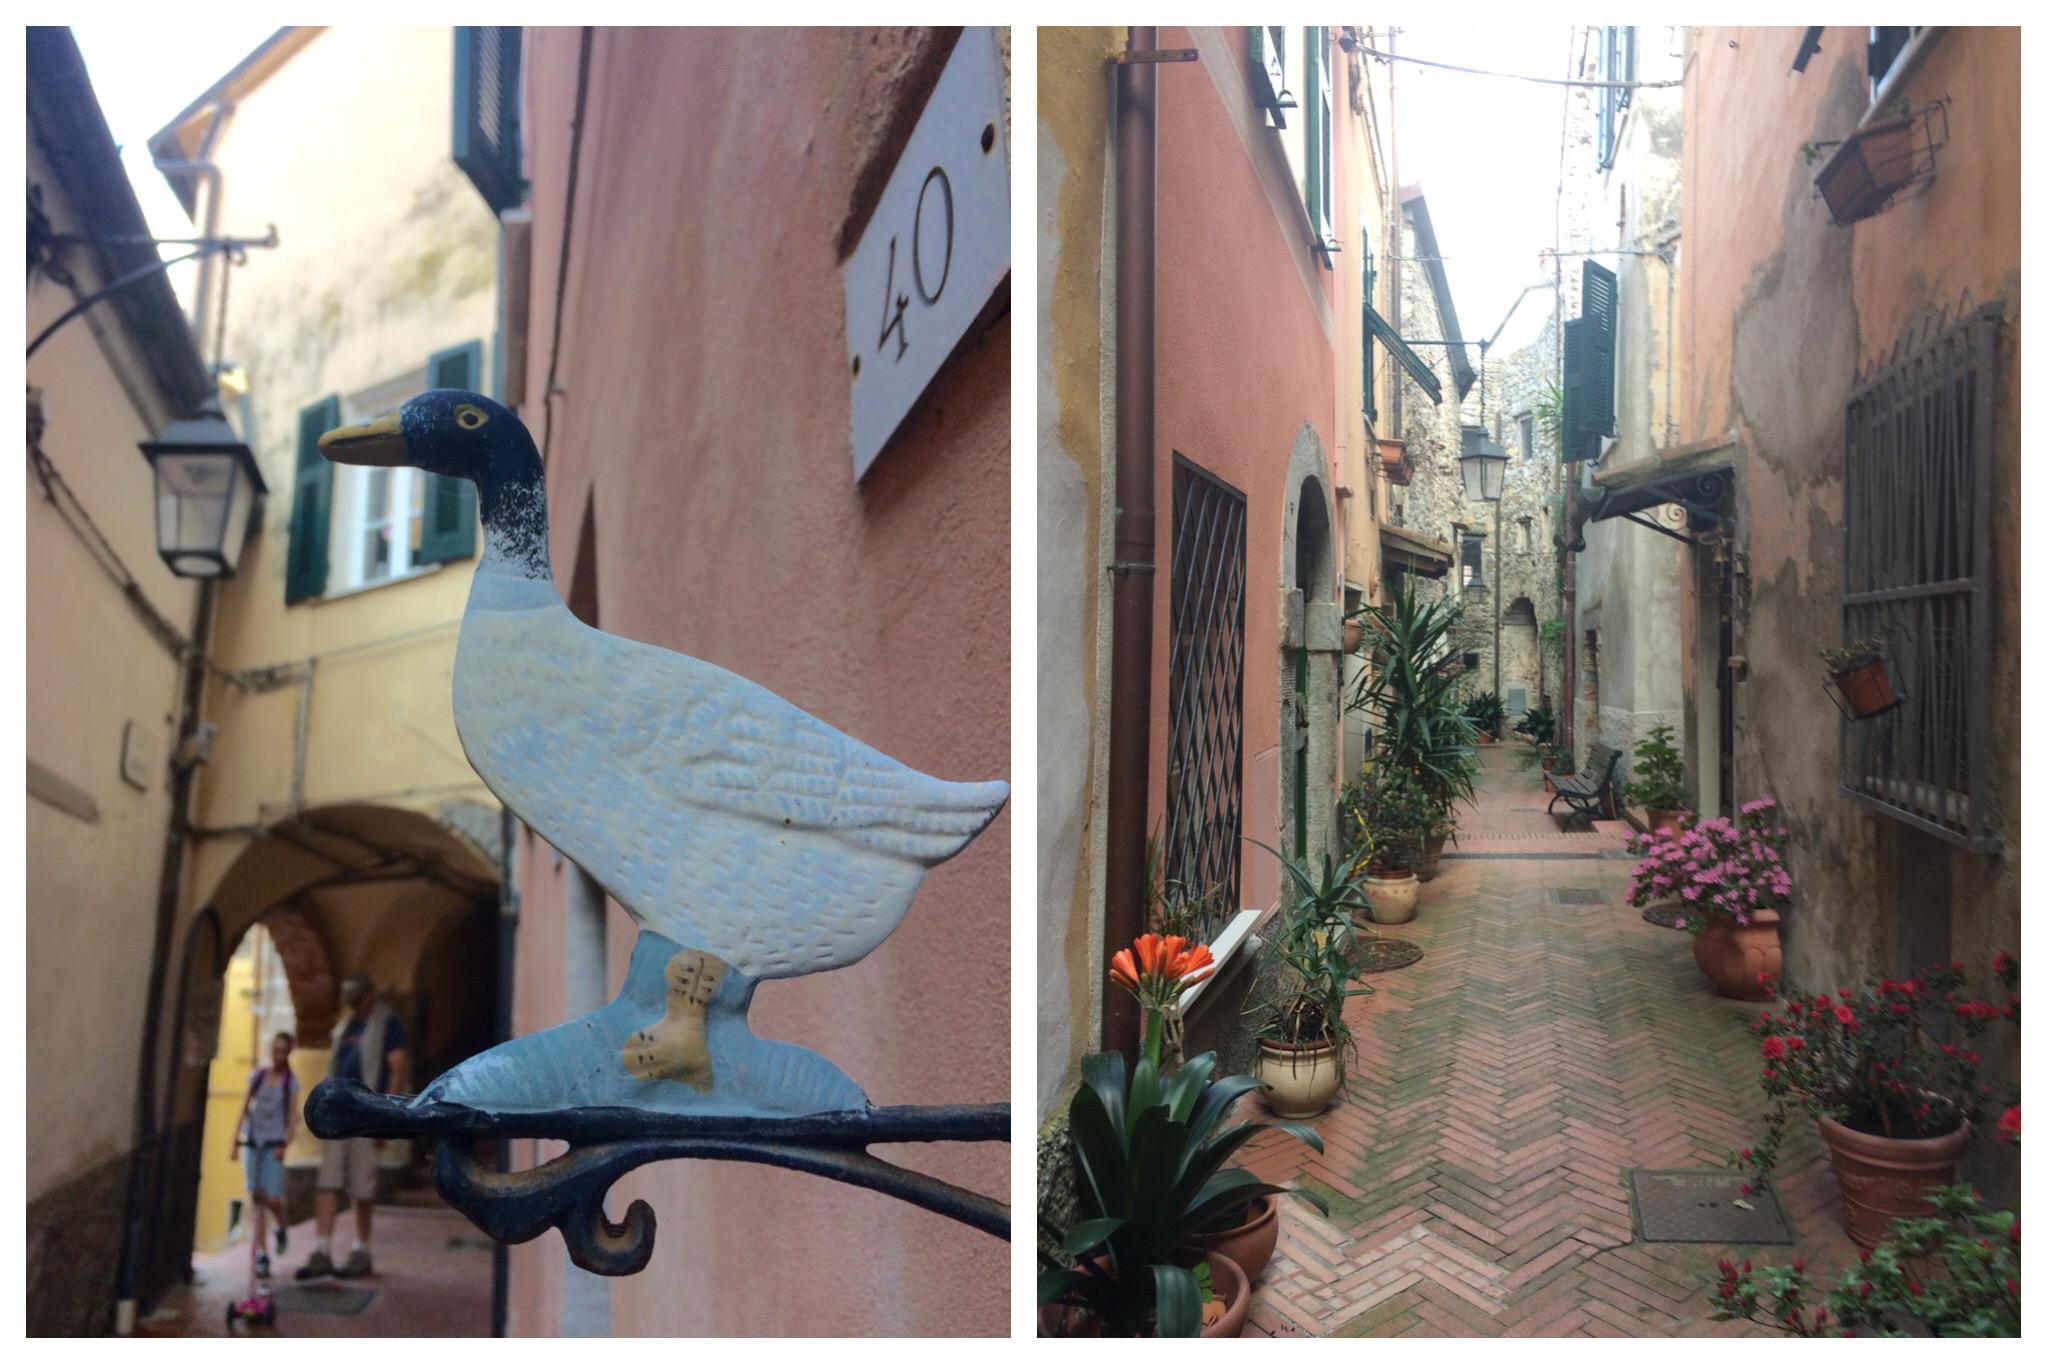 Liguria - Ameglia old town narrow streets